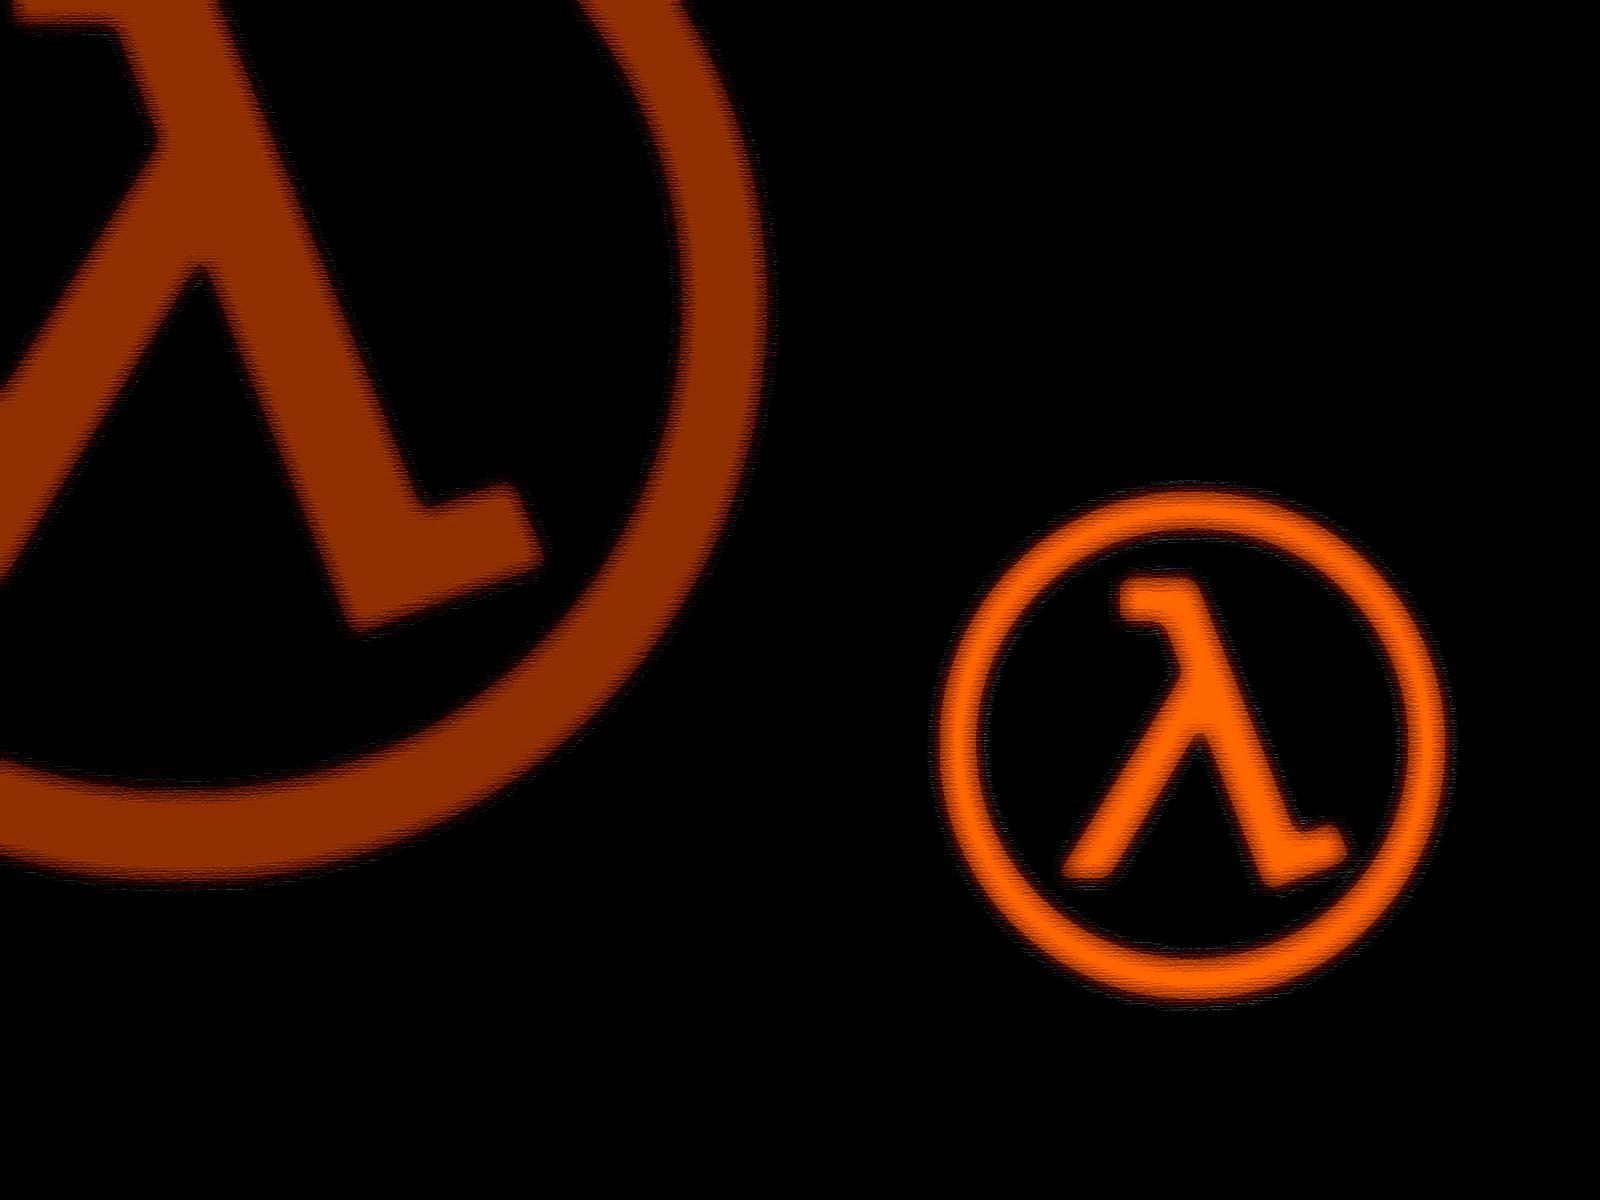 Background image 7975 - Video Game Half Life Wallpaper